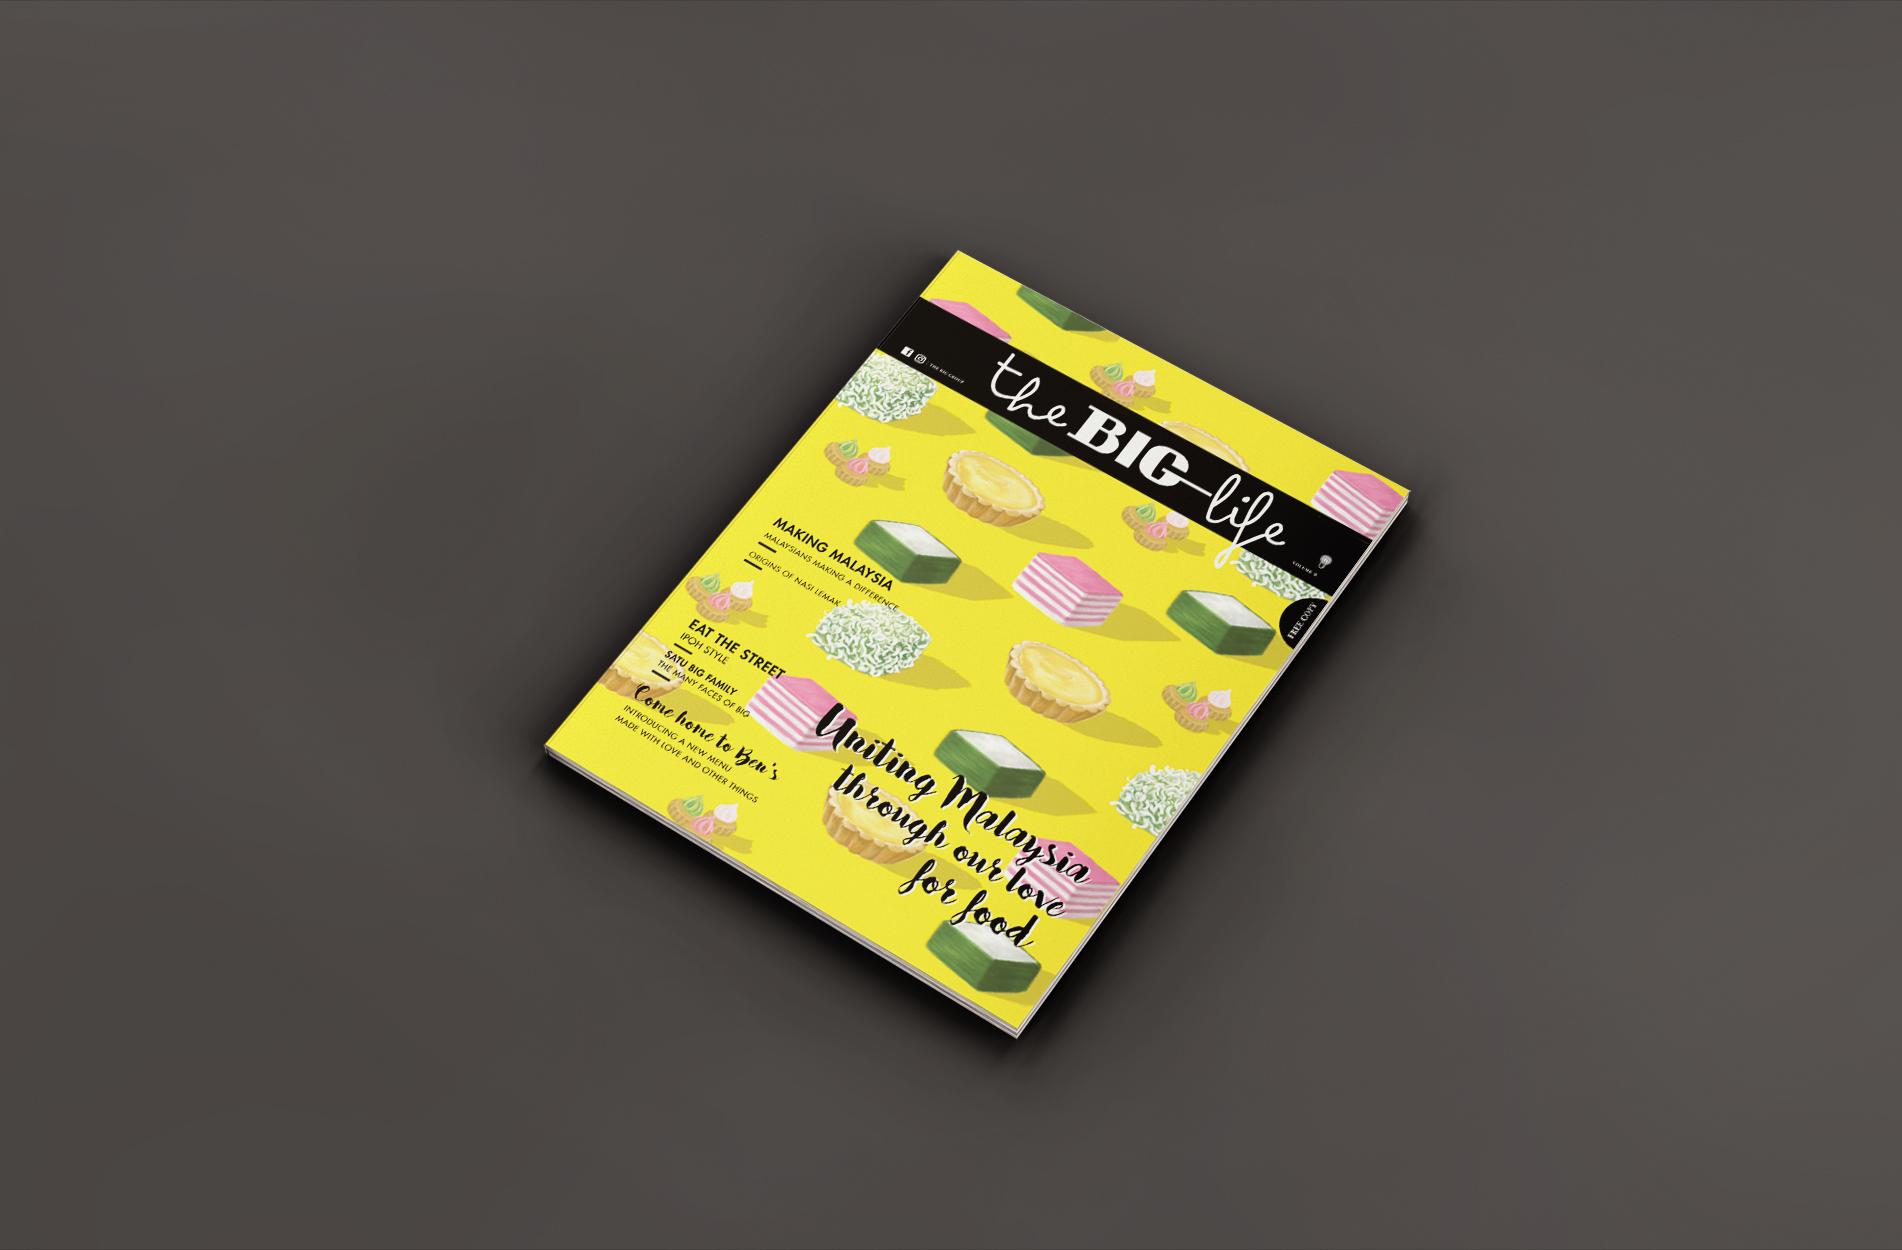 TBL-magazine-mockup.jpg